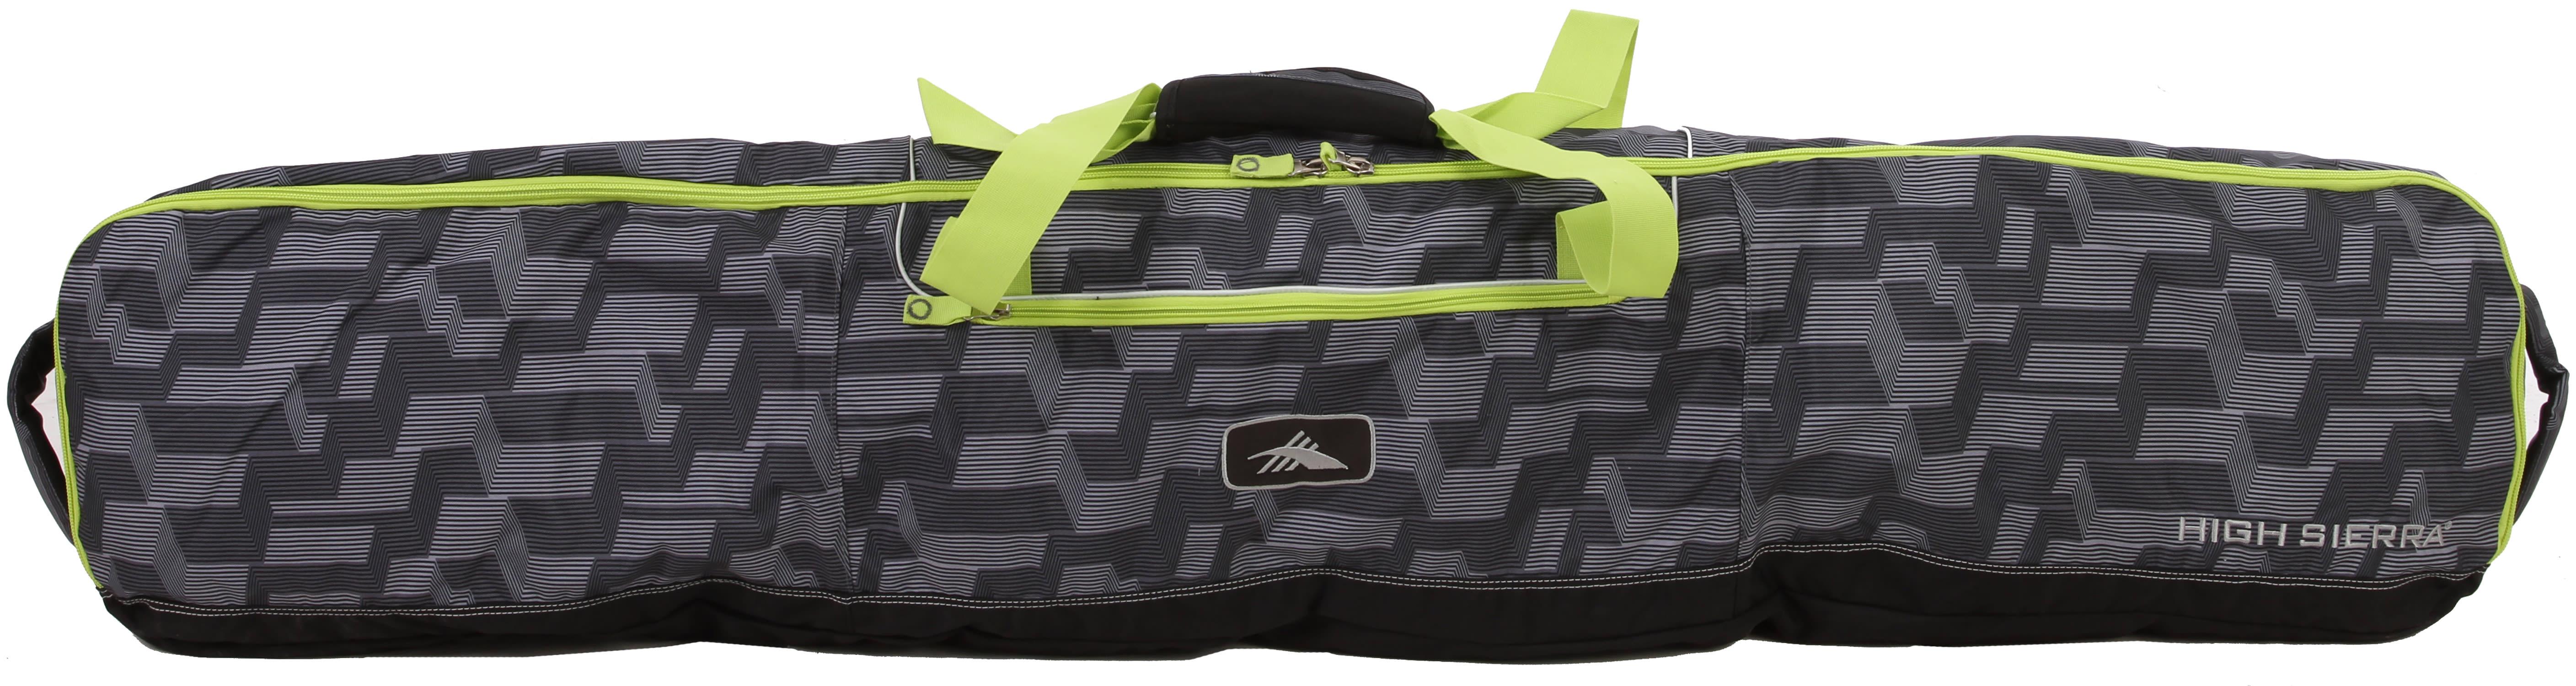 3b49e7b2c4e0 High Sierra Deluxe Sleeve Snowboard Bag - thumbnail 1